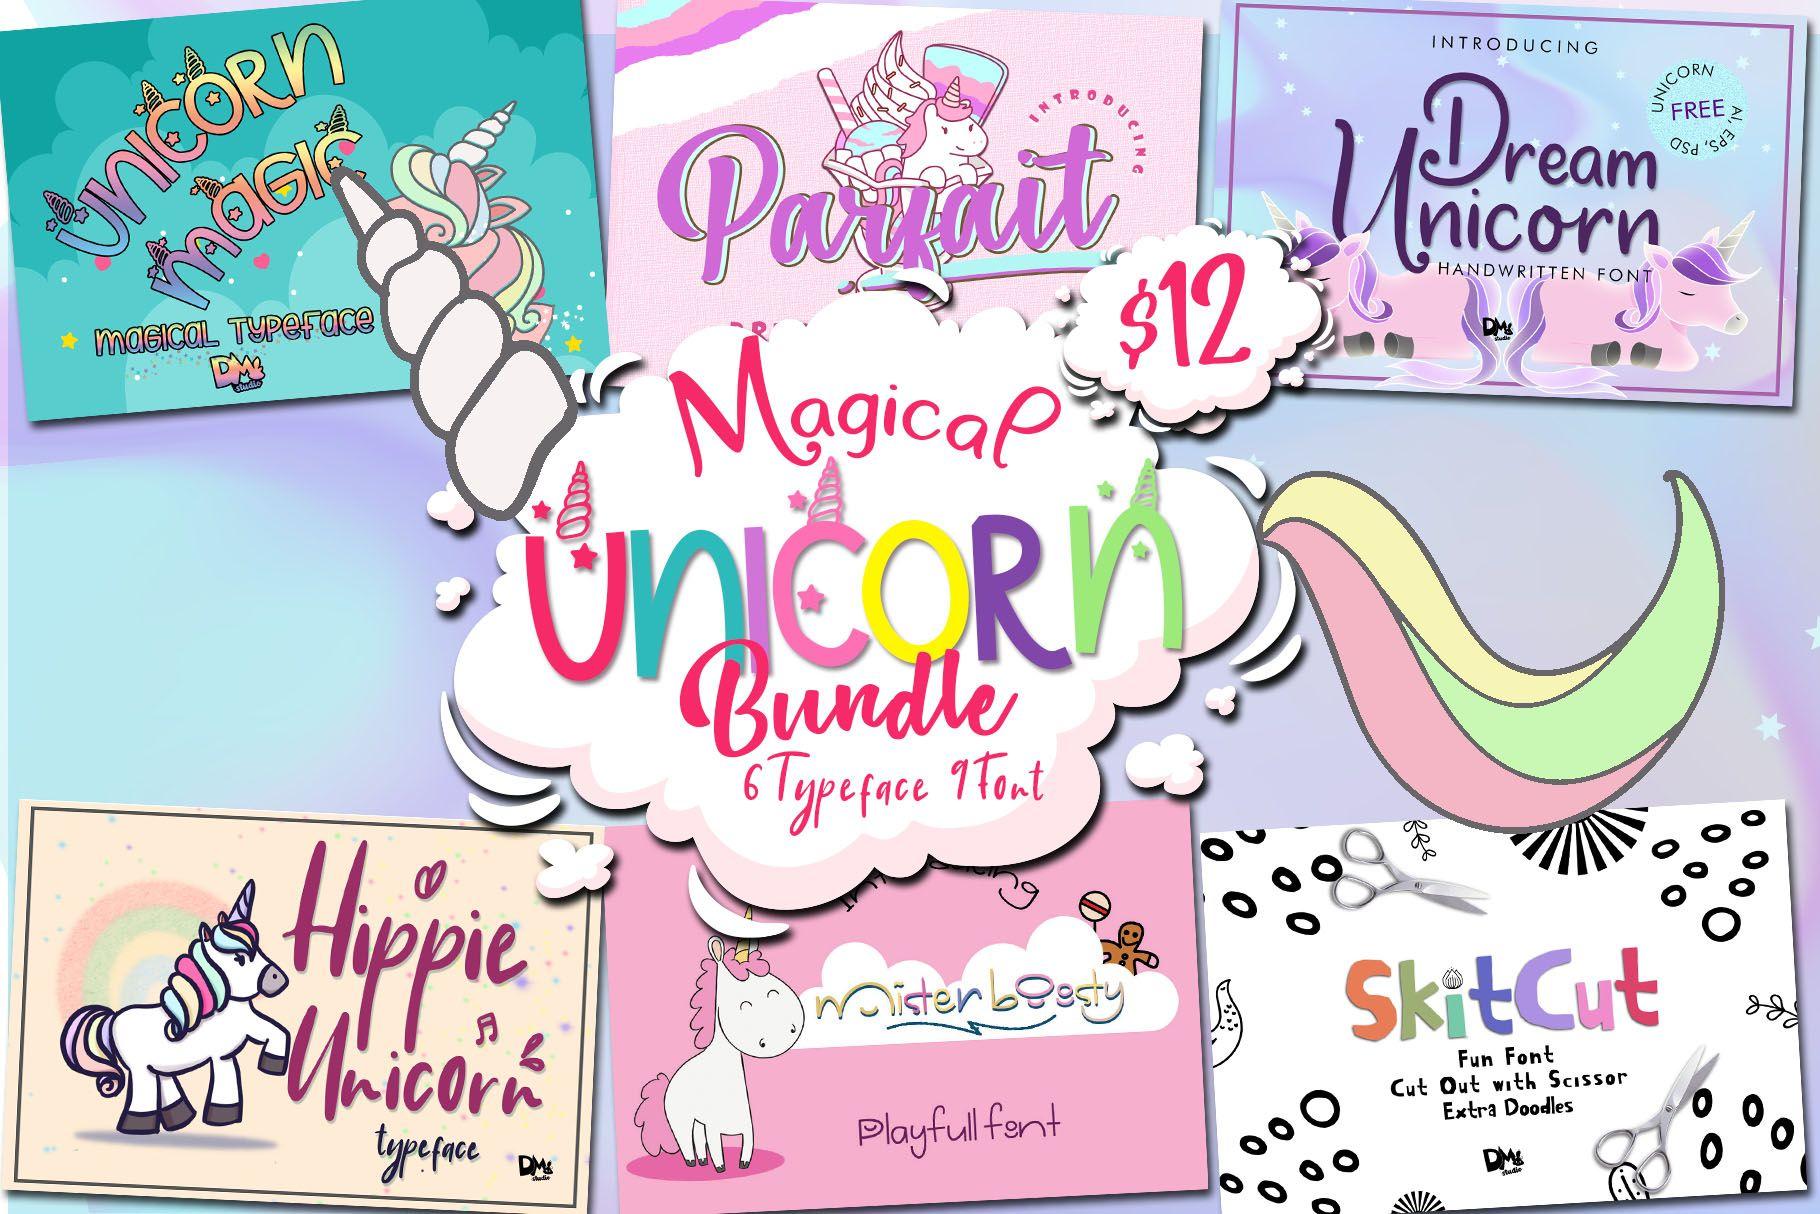 Magical Unicorn Bundle (With images) Christmas fonts